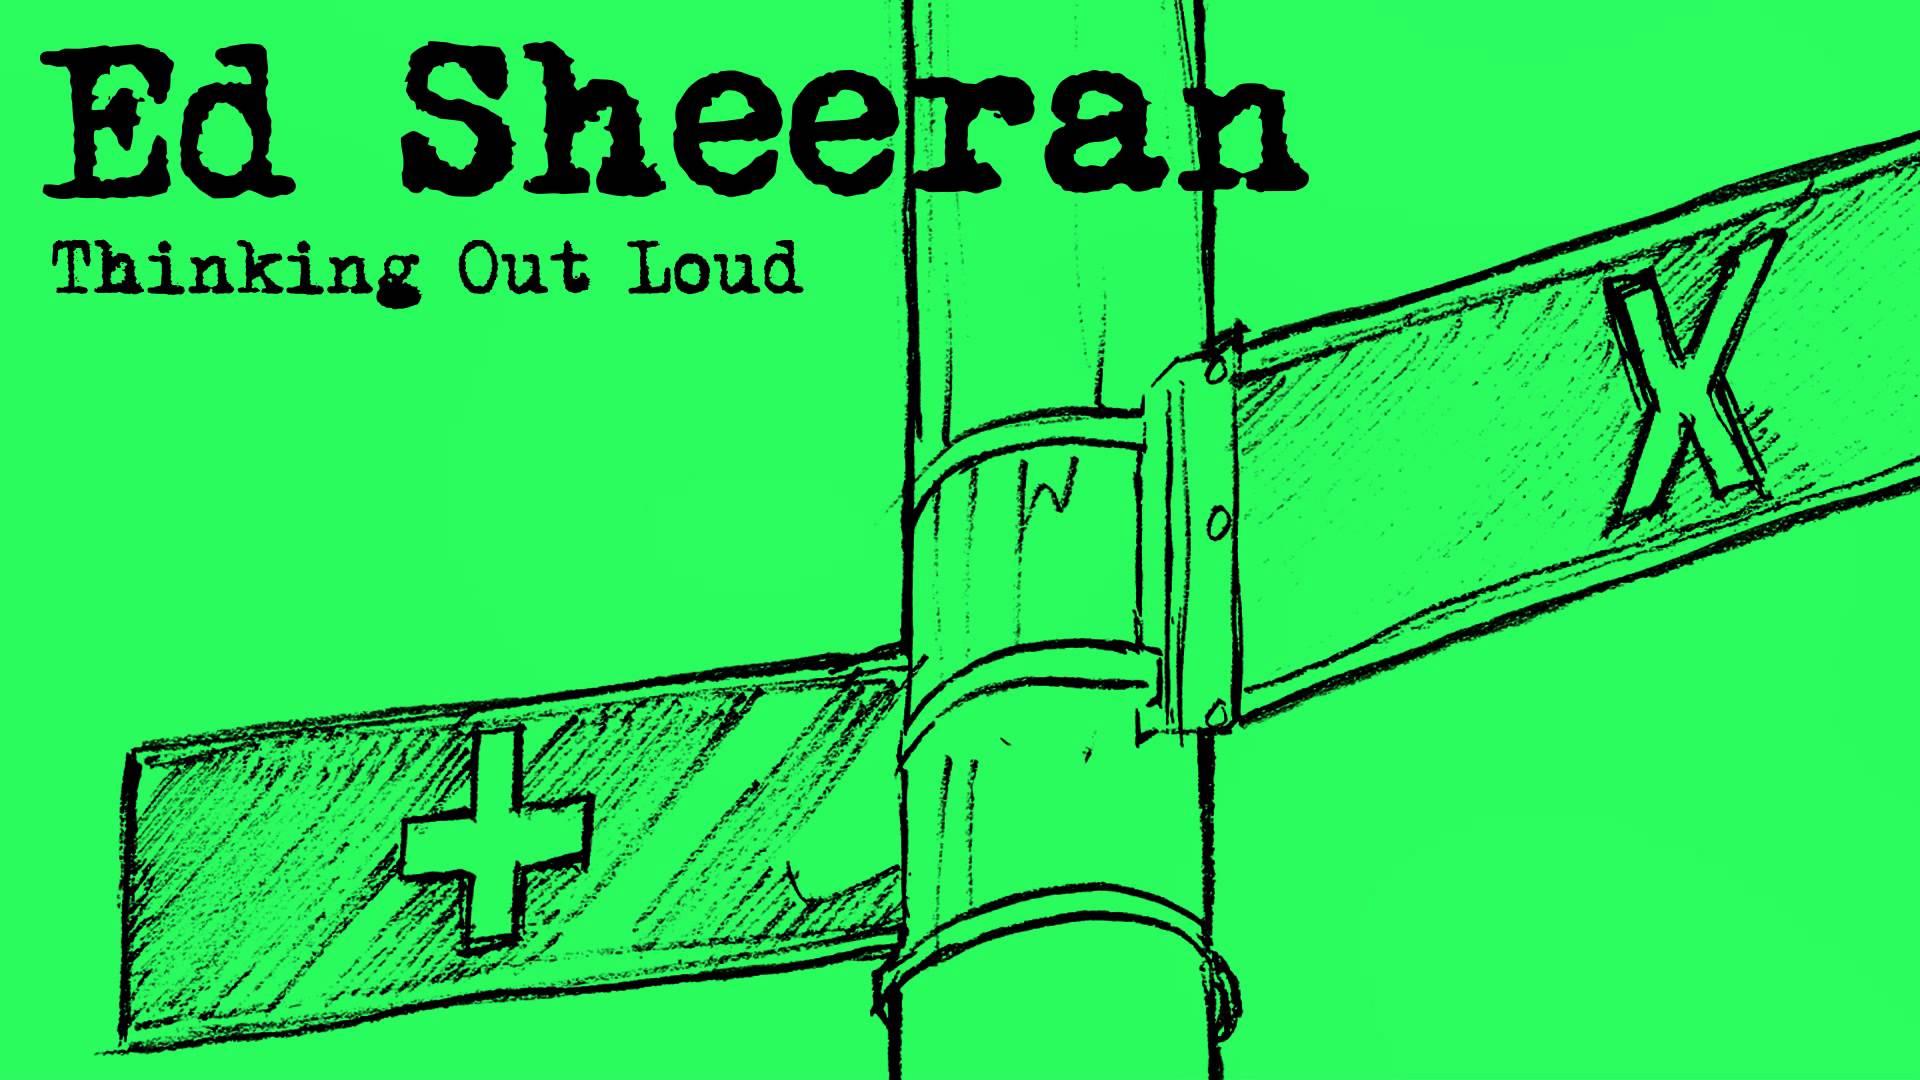 第35屆全英音樂獎Taylor Swift、Ed Sheeran、Sam Smith參與演出